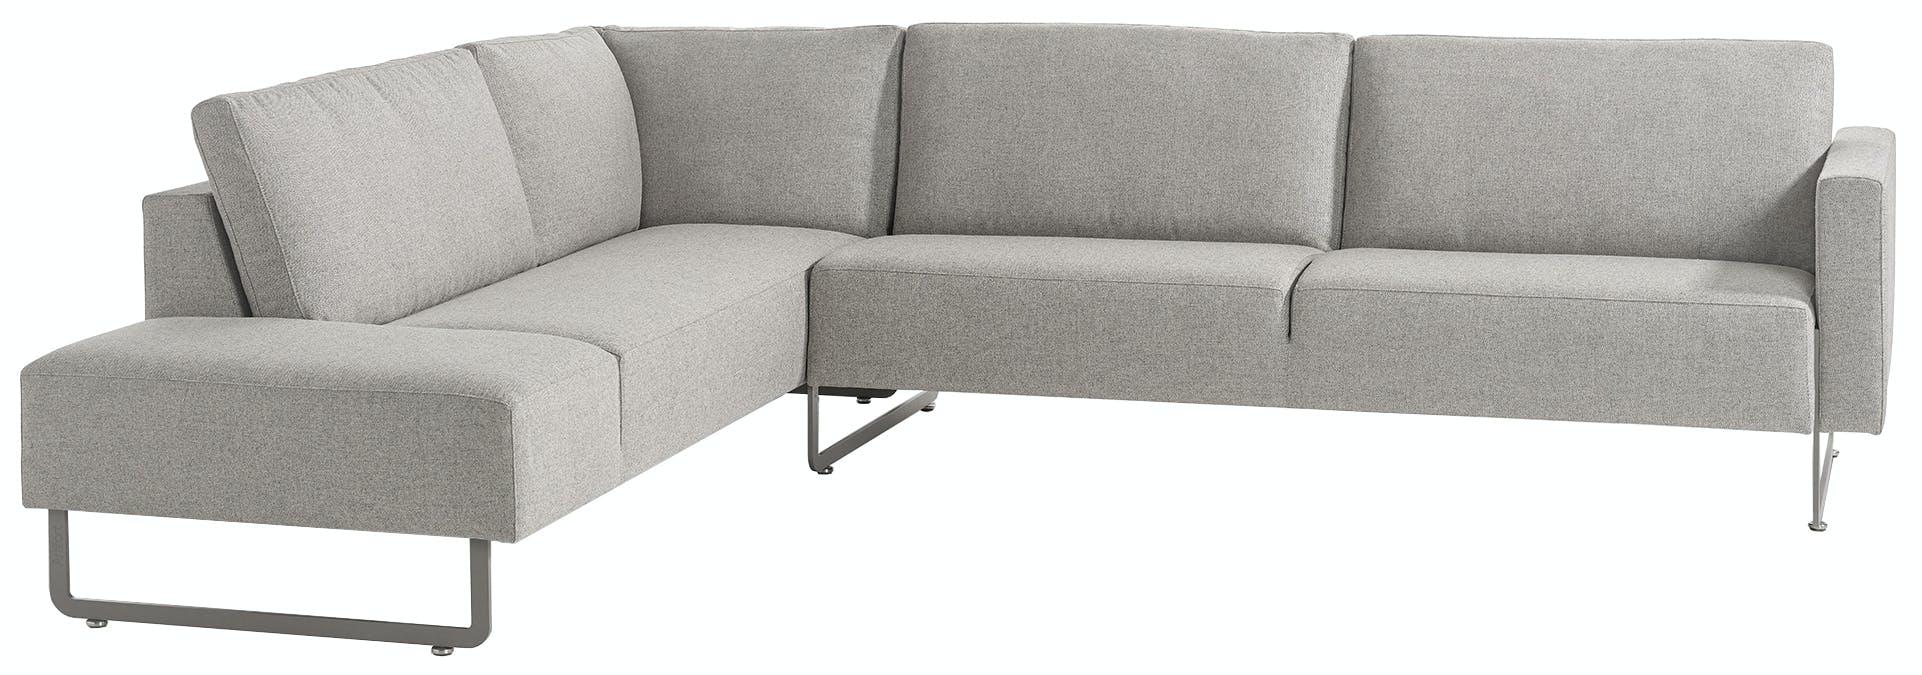 Artifort Mare Loose Cushion Sofa Thumbnail